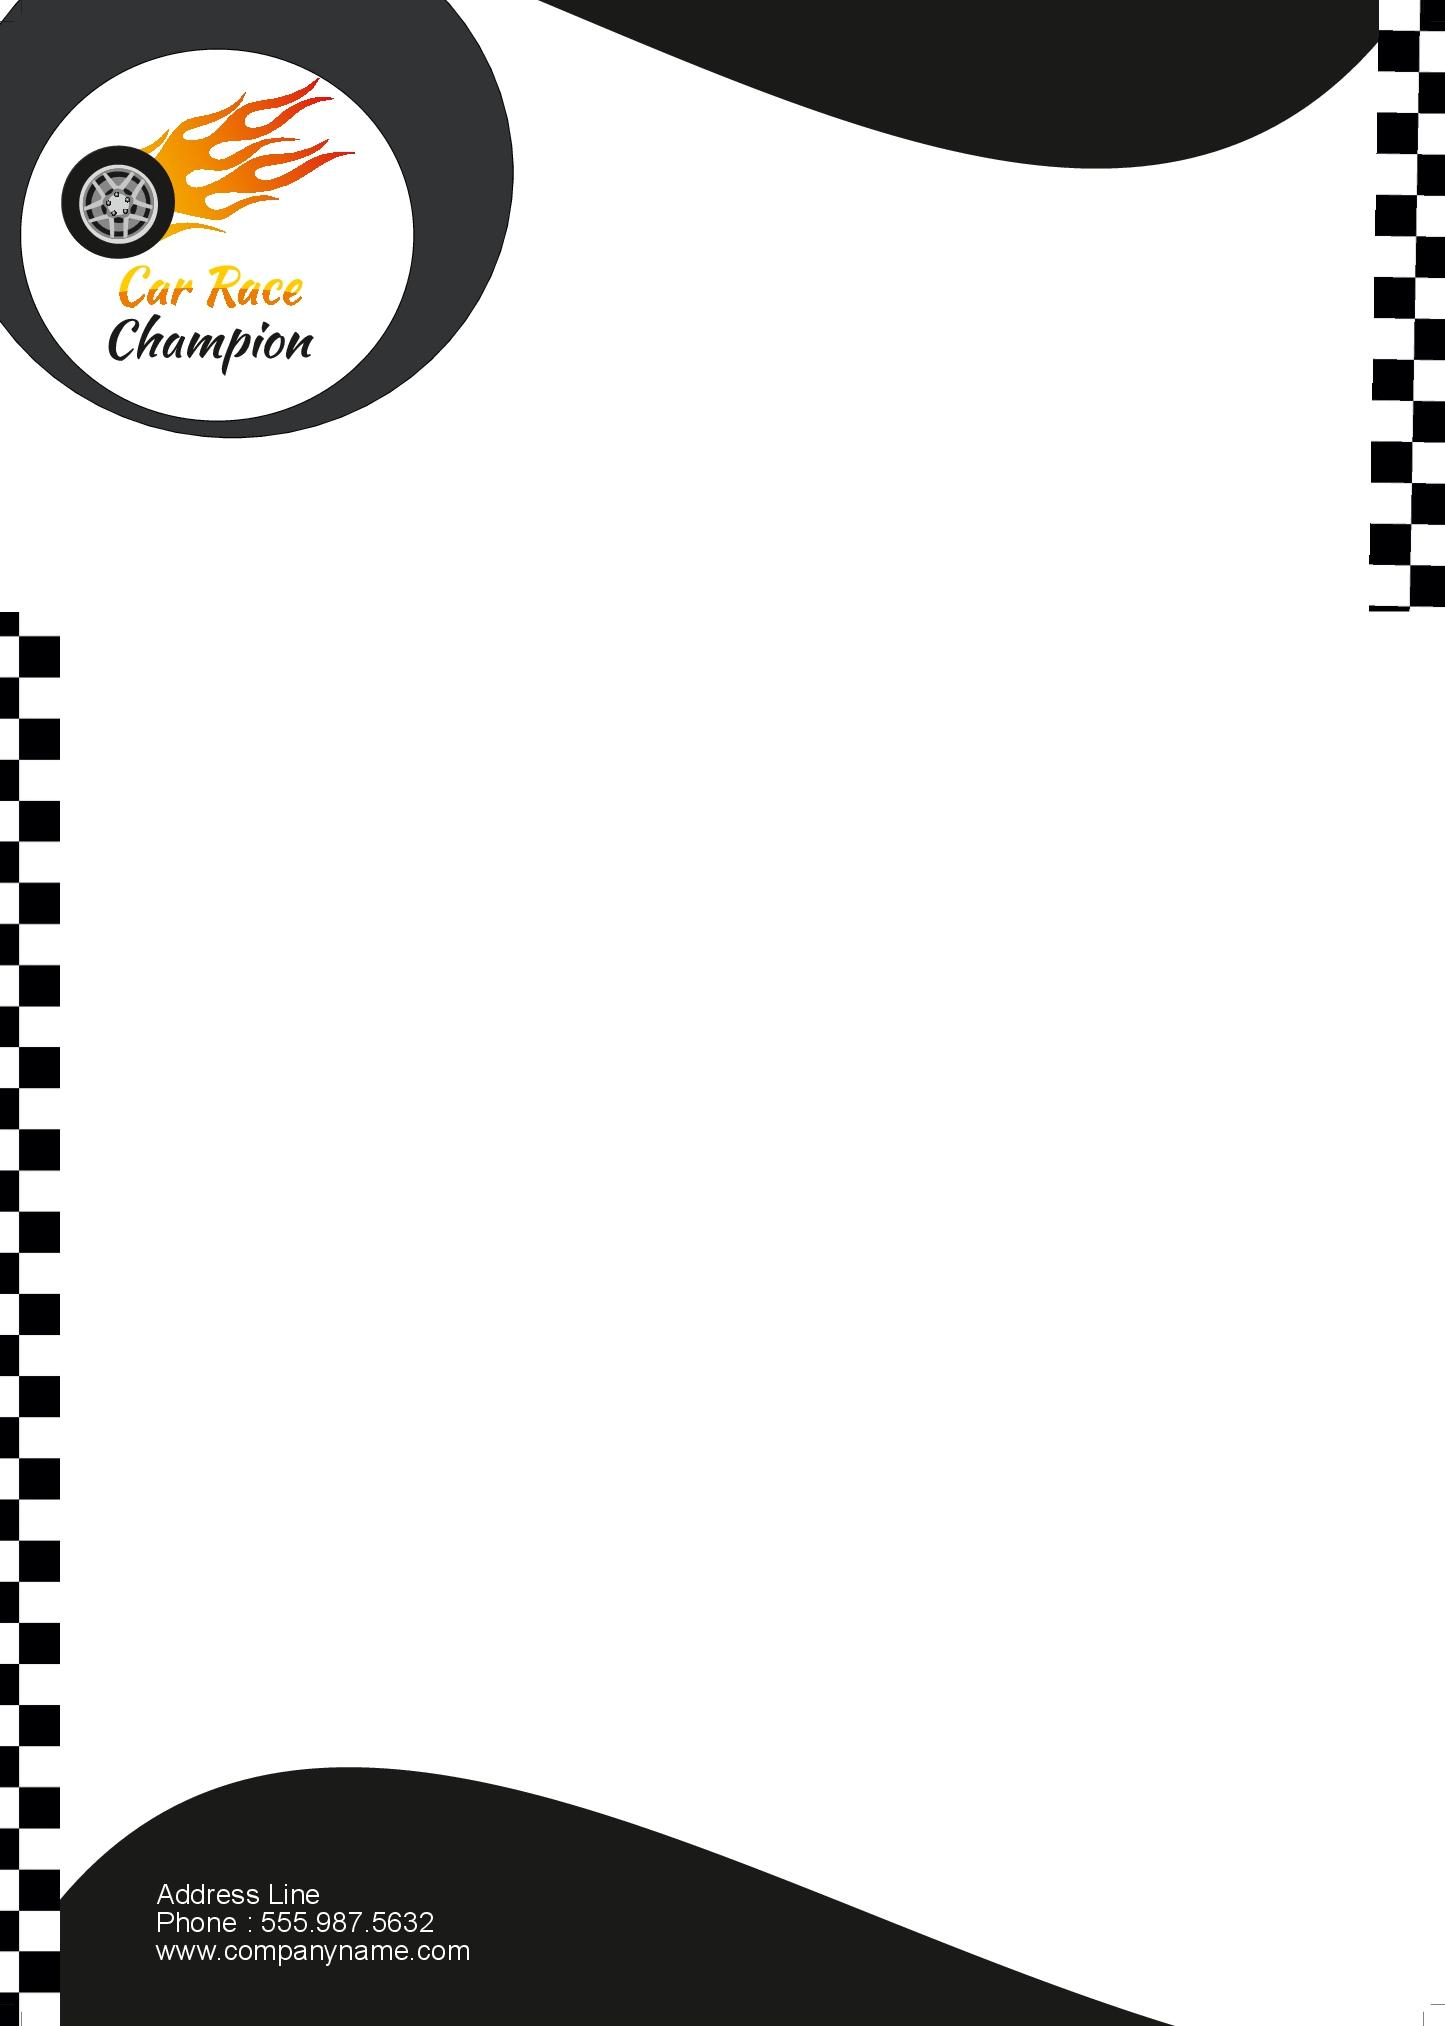 Letterheads carracechampionletterhead carracechampionletterhead spiritdancerdesigns Gallery